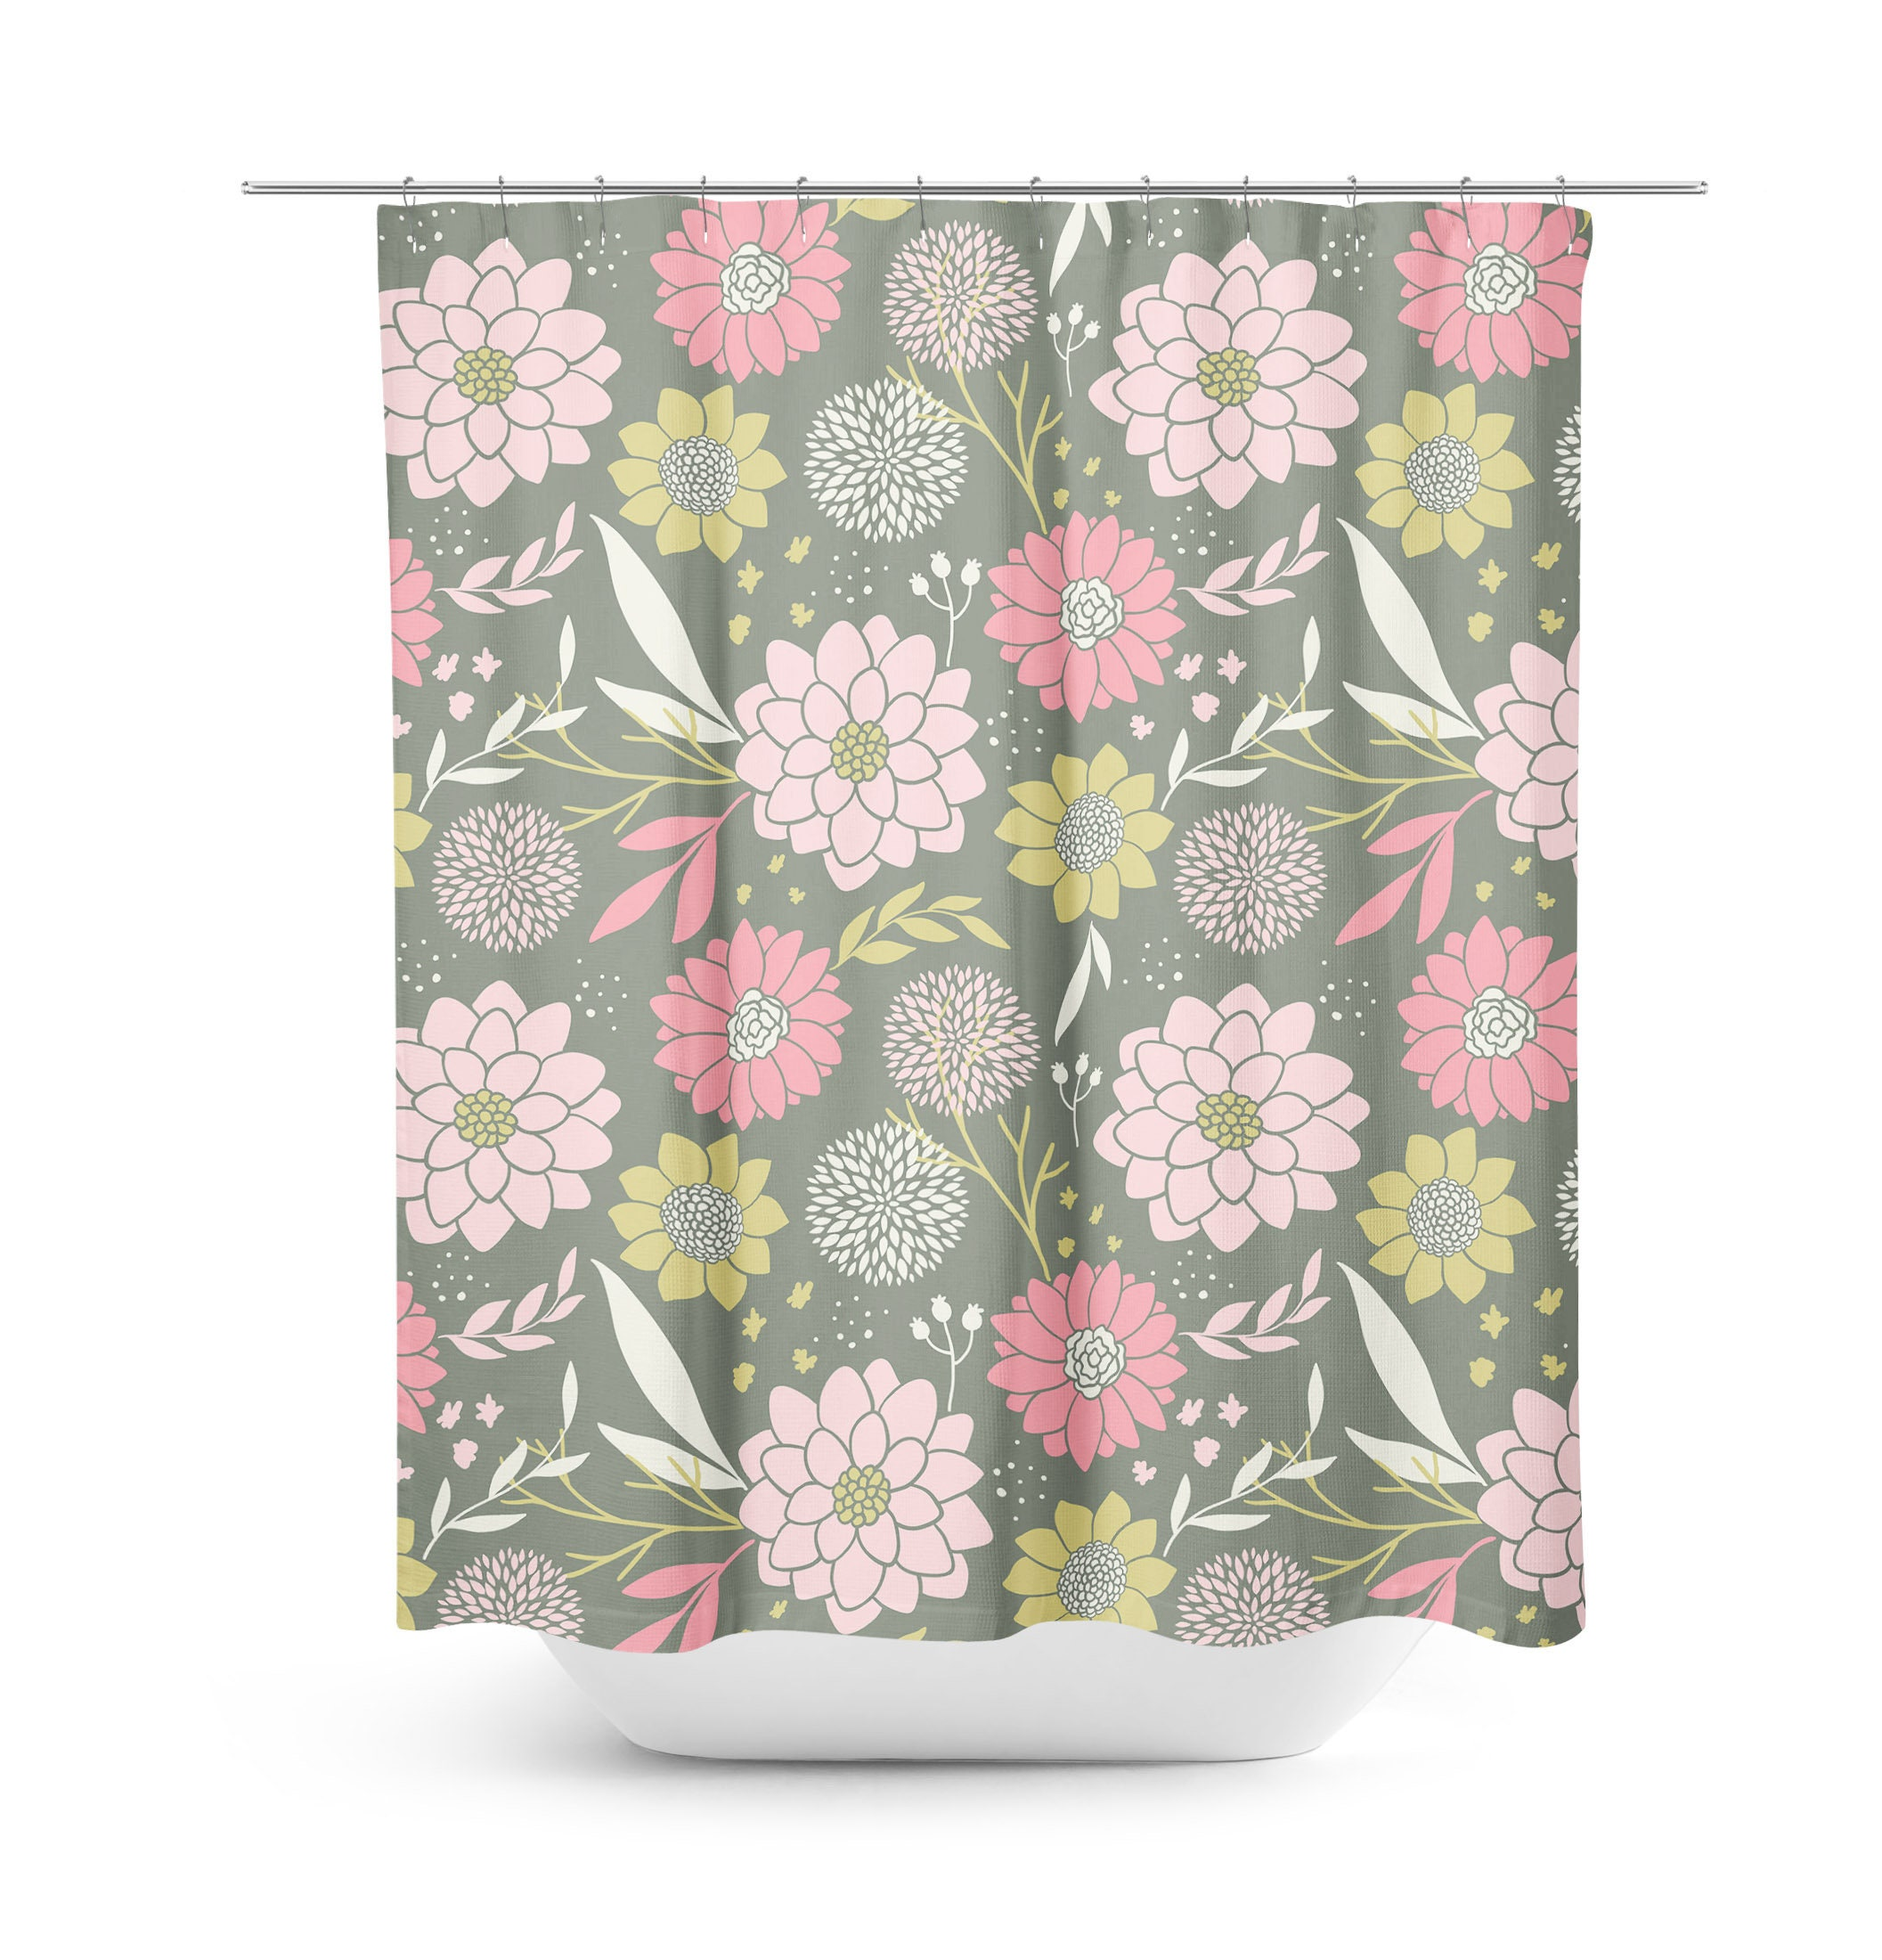 Pink Shower Curtain Flowers Bathroom Decor Light Girl Teen Geometric Floral